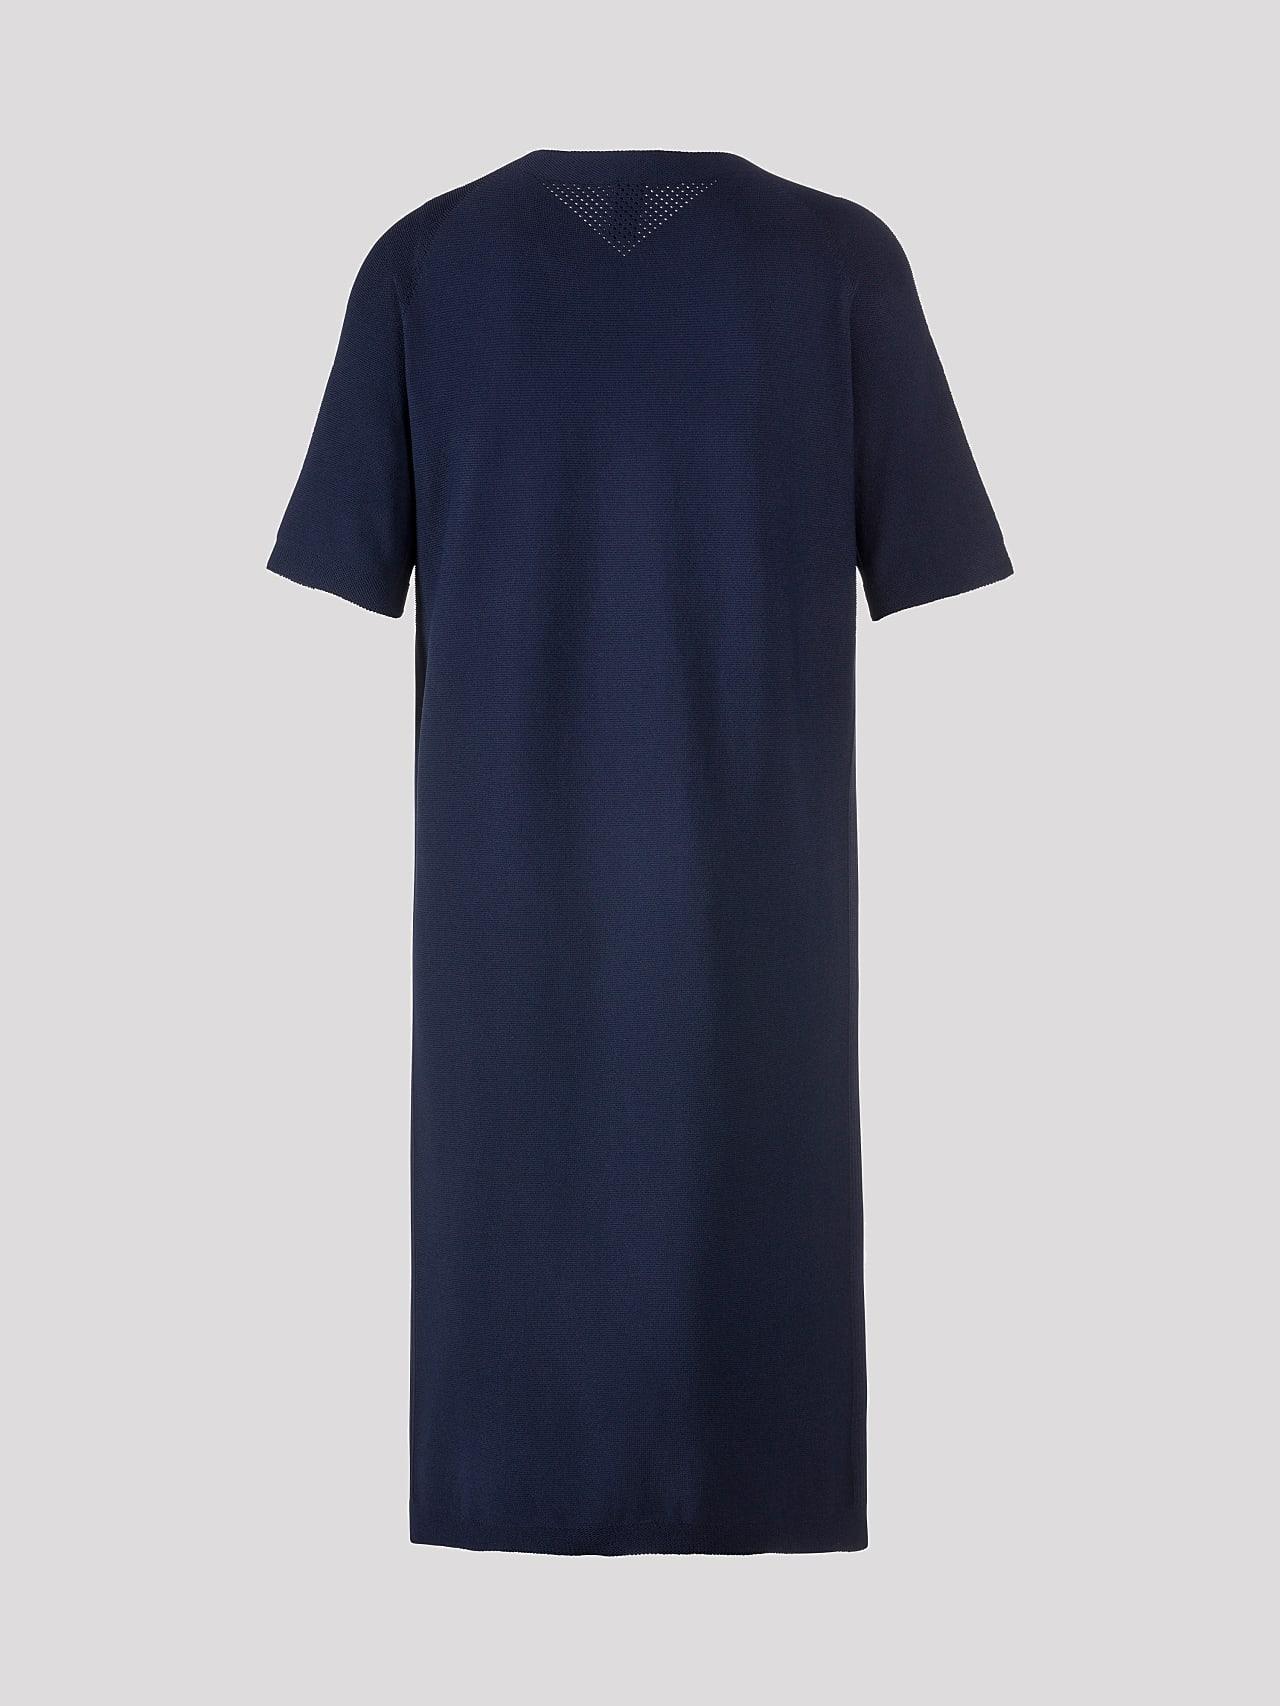 FZORF V1.Y5.01 Seamless Knit Dress navy Left Alpha Tauri